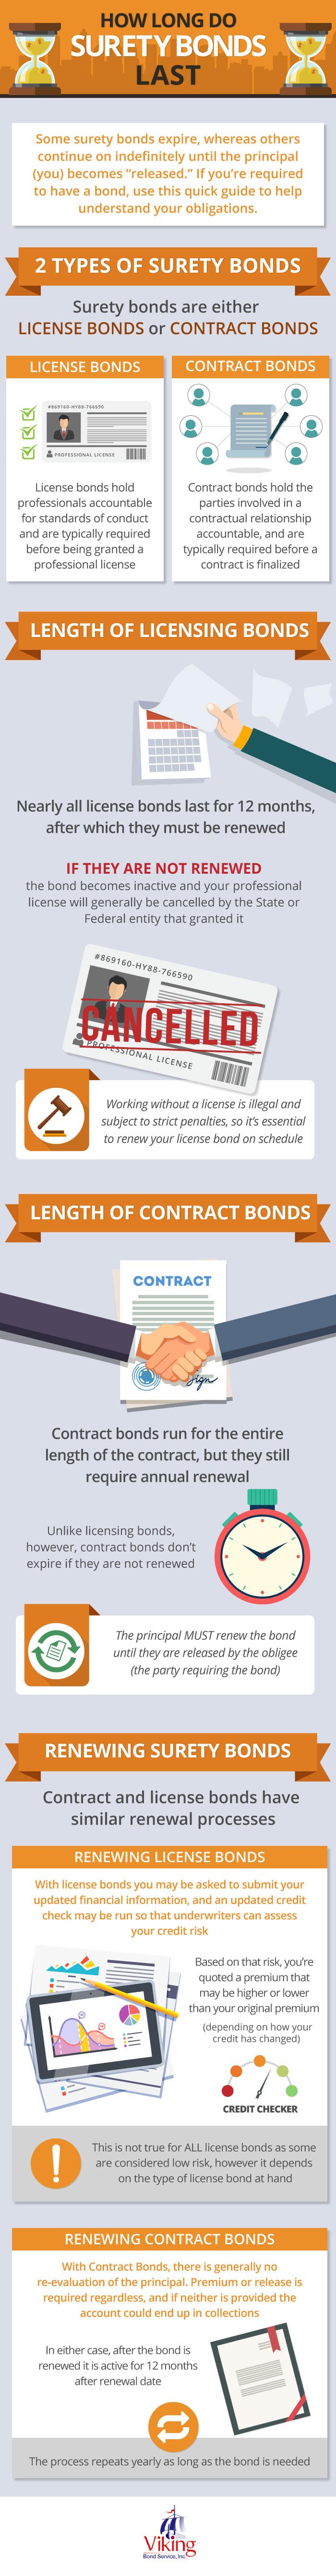 How Long Do Surety Bonds Last?